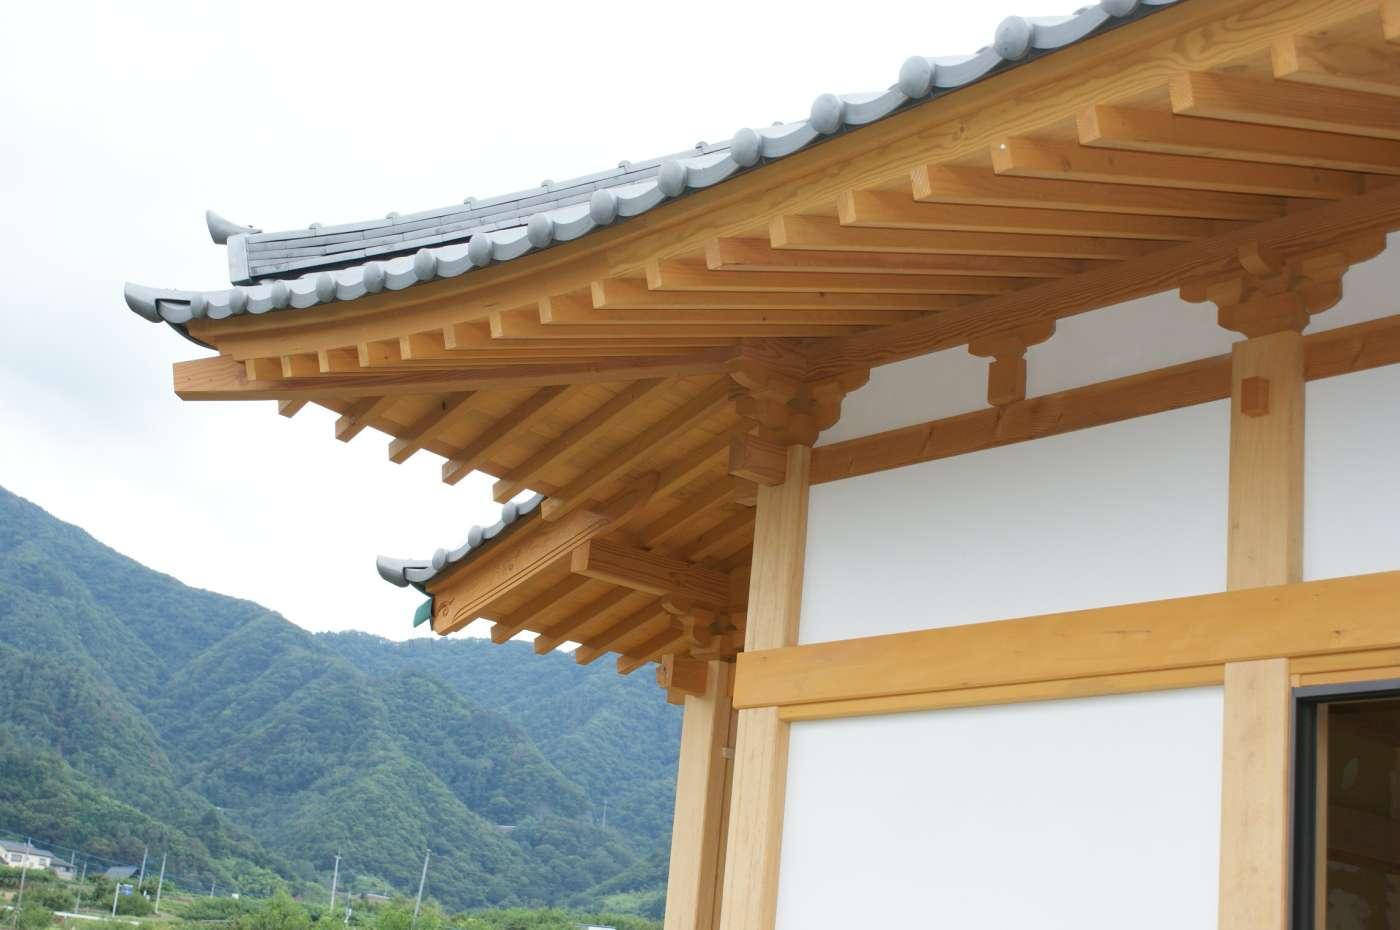 http://sumainomatsuki.com/folder1/DSC04892.JPG